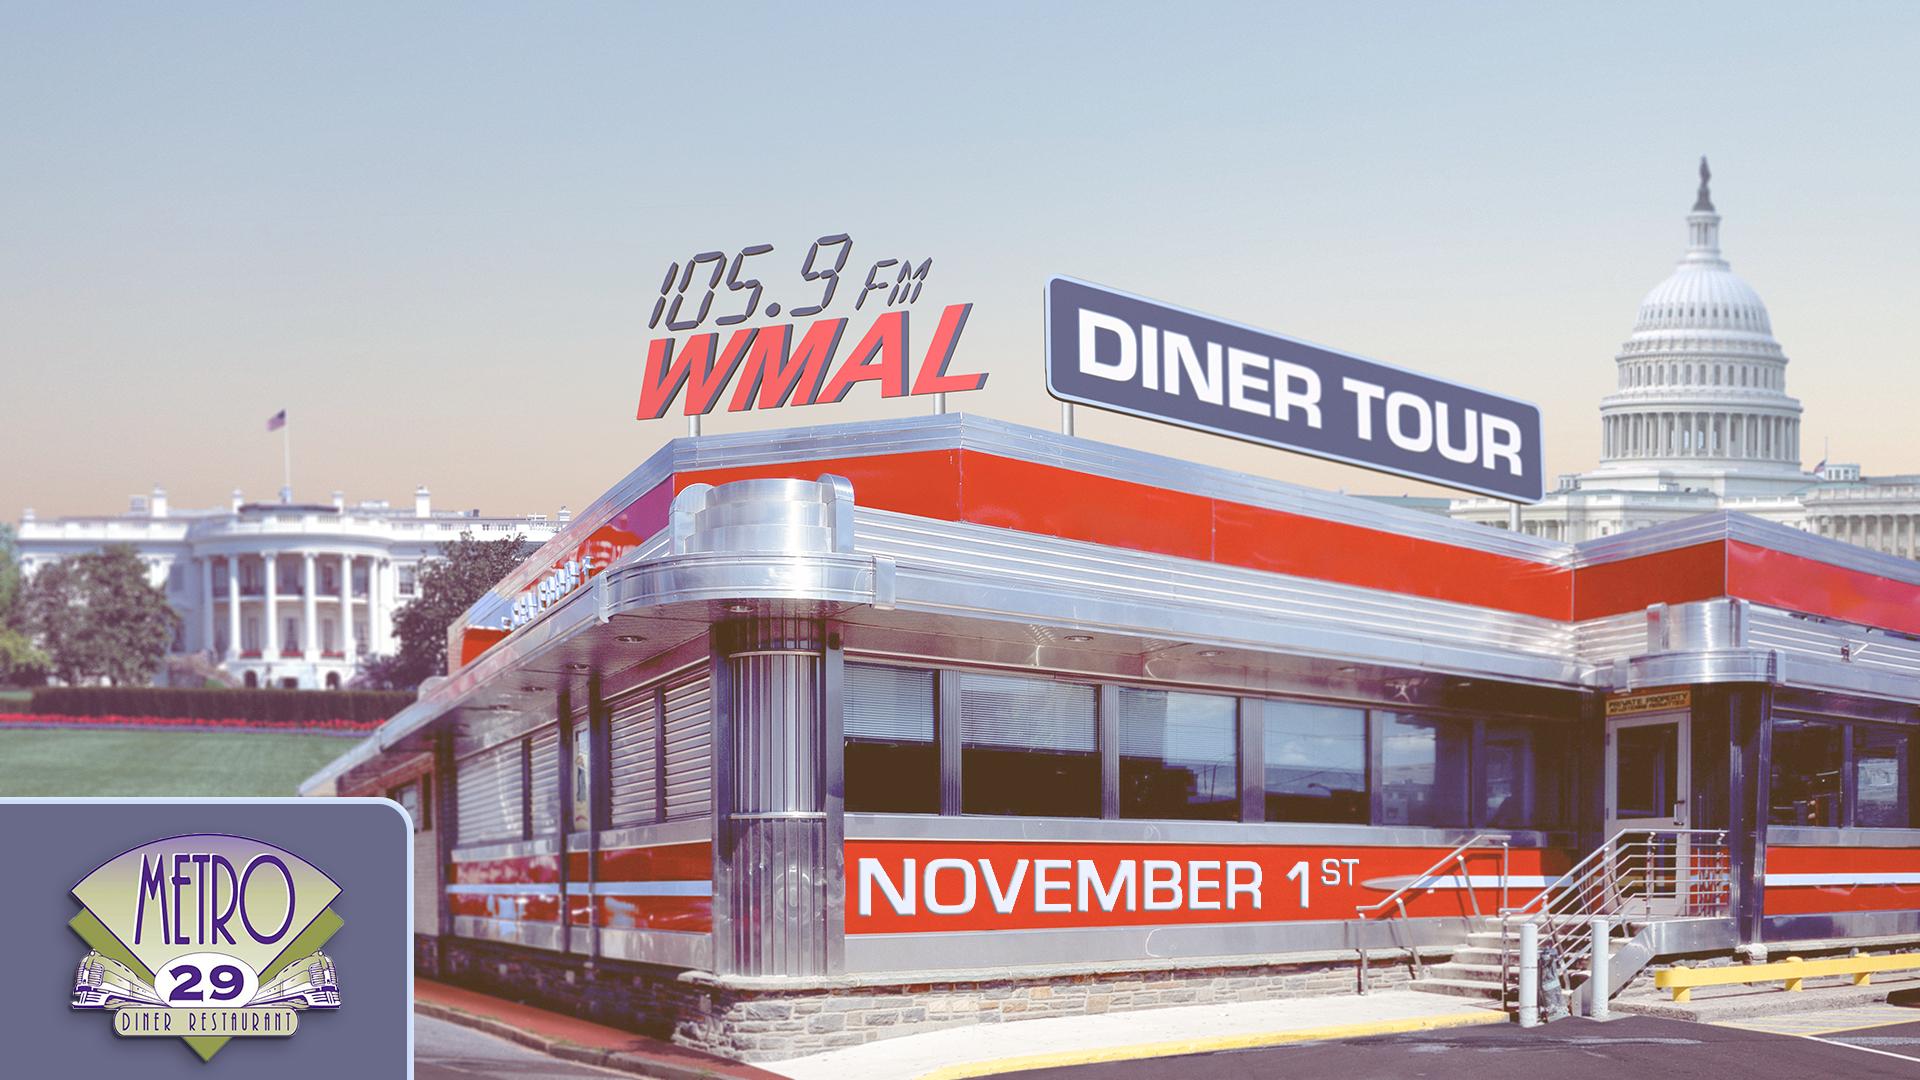 Diner-Tour-2019-ART1